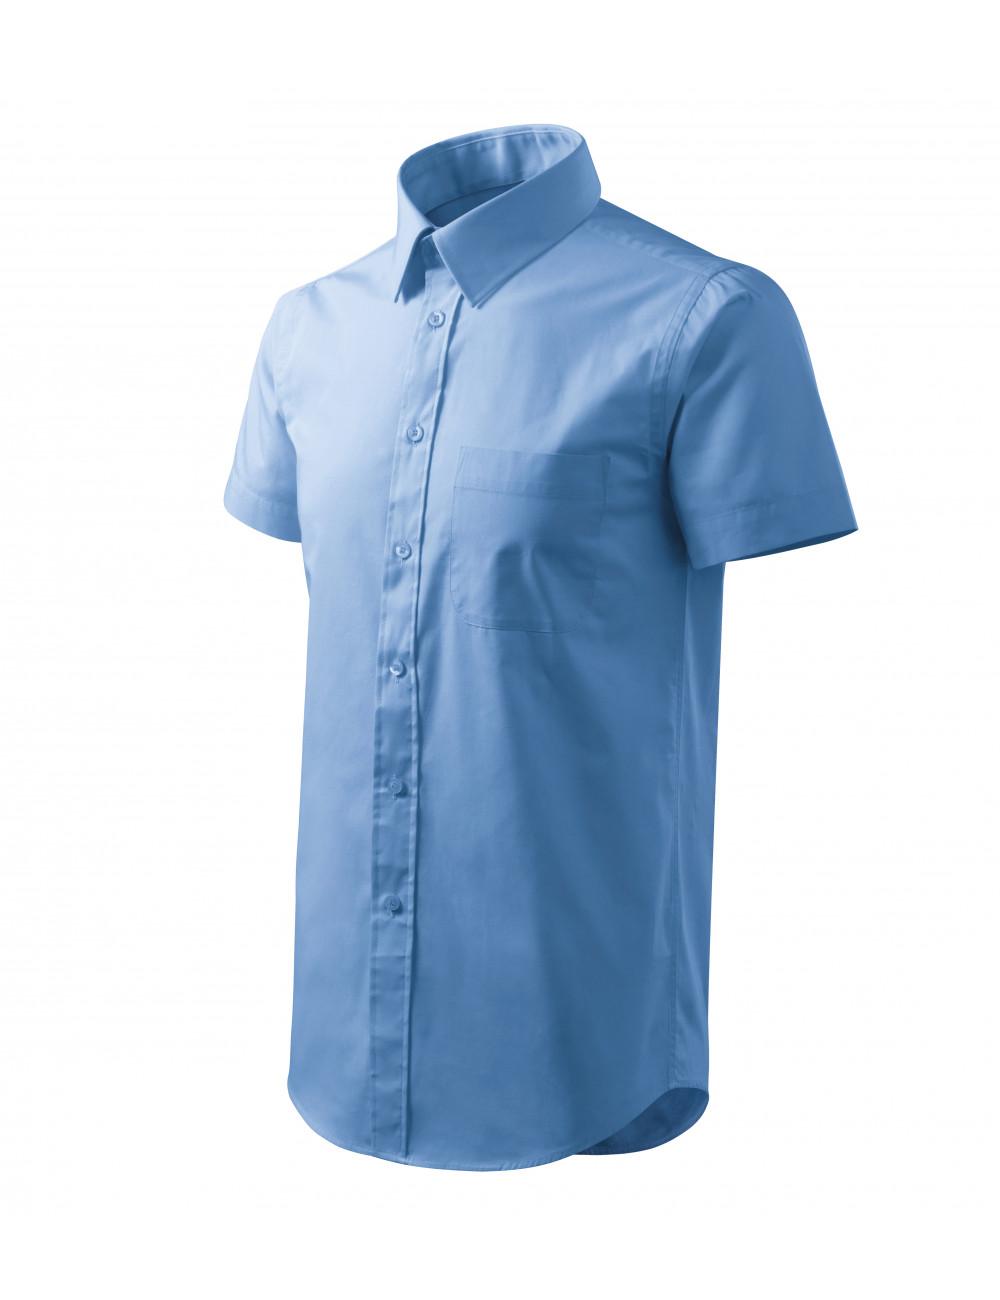 Adler MALFINI Koszula męska Chic 207 błękitny